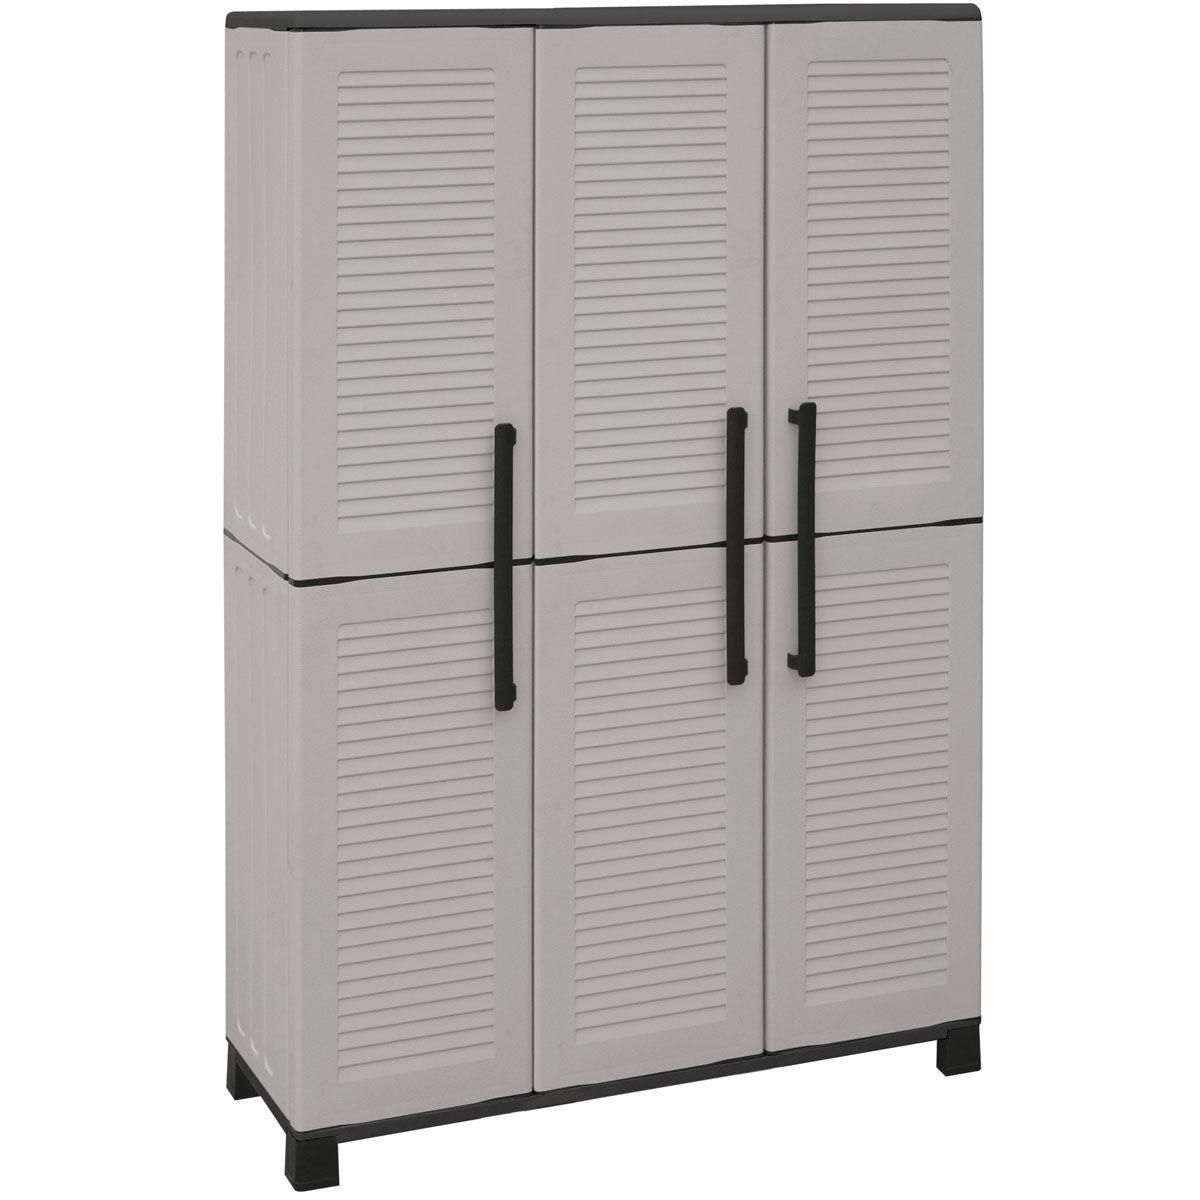 Decorar cuartos con manualidades armarios plastico exterior for Armarios plastico para exterior baratos